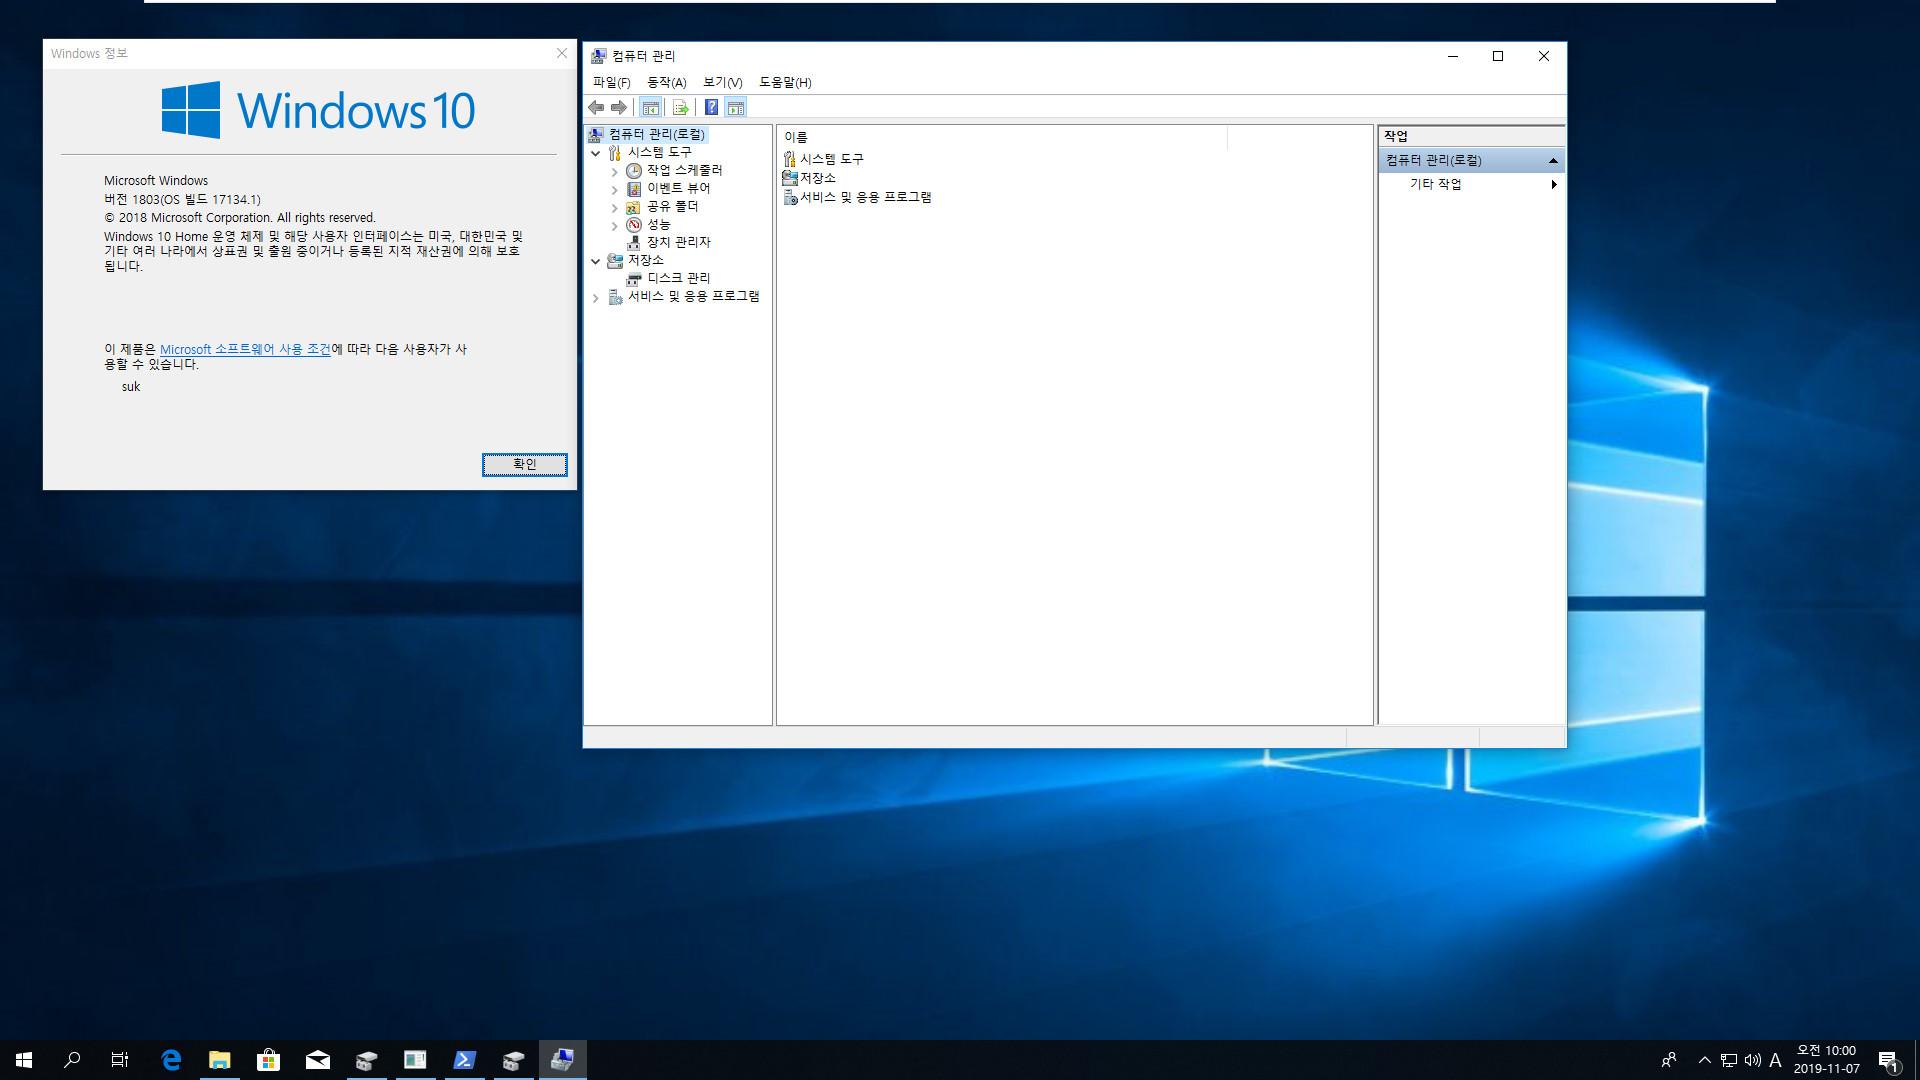 Windows 10 업데이트 방지하기 [업데이트 다운로드 폴더 사용 금지].bat 테스트 - 버전 1803, Home 에서 버전 1903 기능 업데이트 방지하기 - 적용 후에 컴퓨터 관리 불가 상태 해결 방법 - 먼저 관리자 권한으로 diskpart [디스크관리] 실행해주시면 다른 것도 마우스로 실행됩니다 2019-11-07_100004.jpg